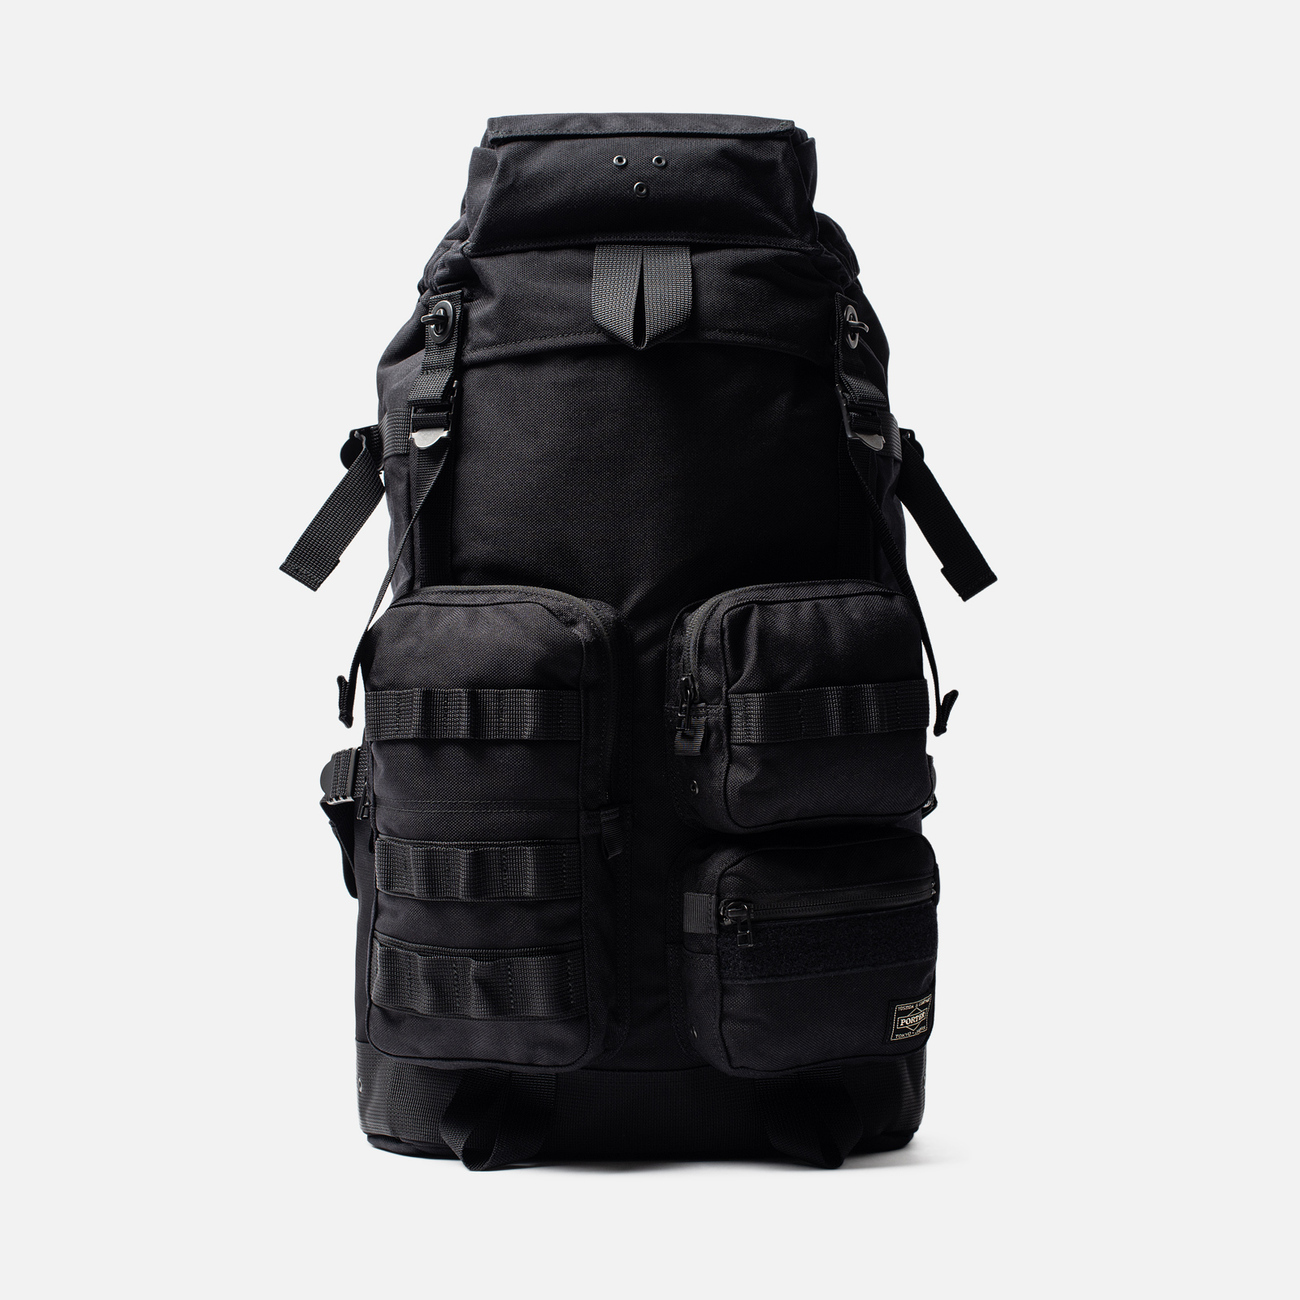 Рюкзак Porter-Yoshida & Co Pals 24L Black